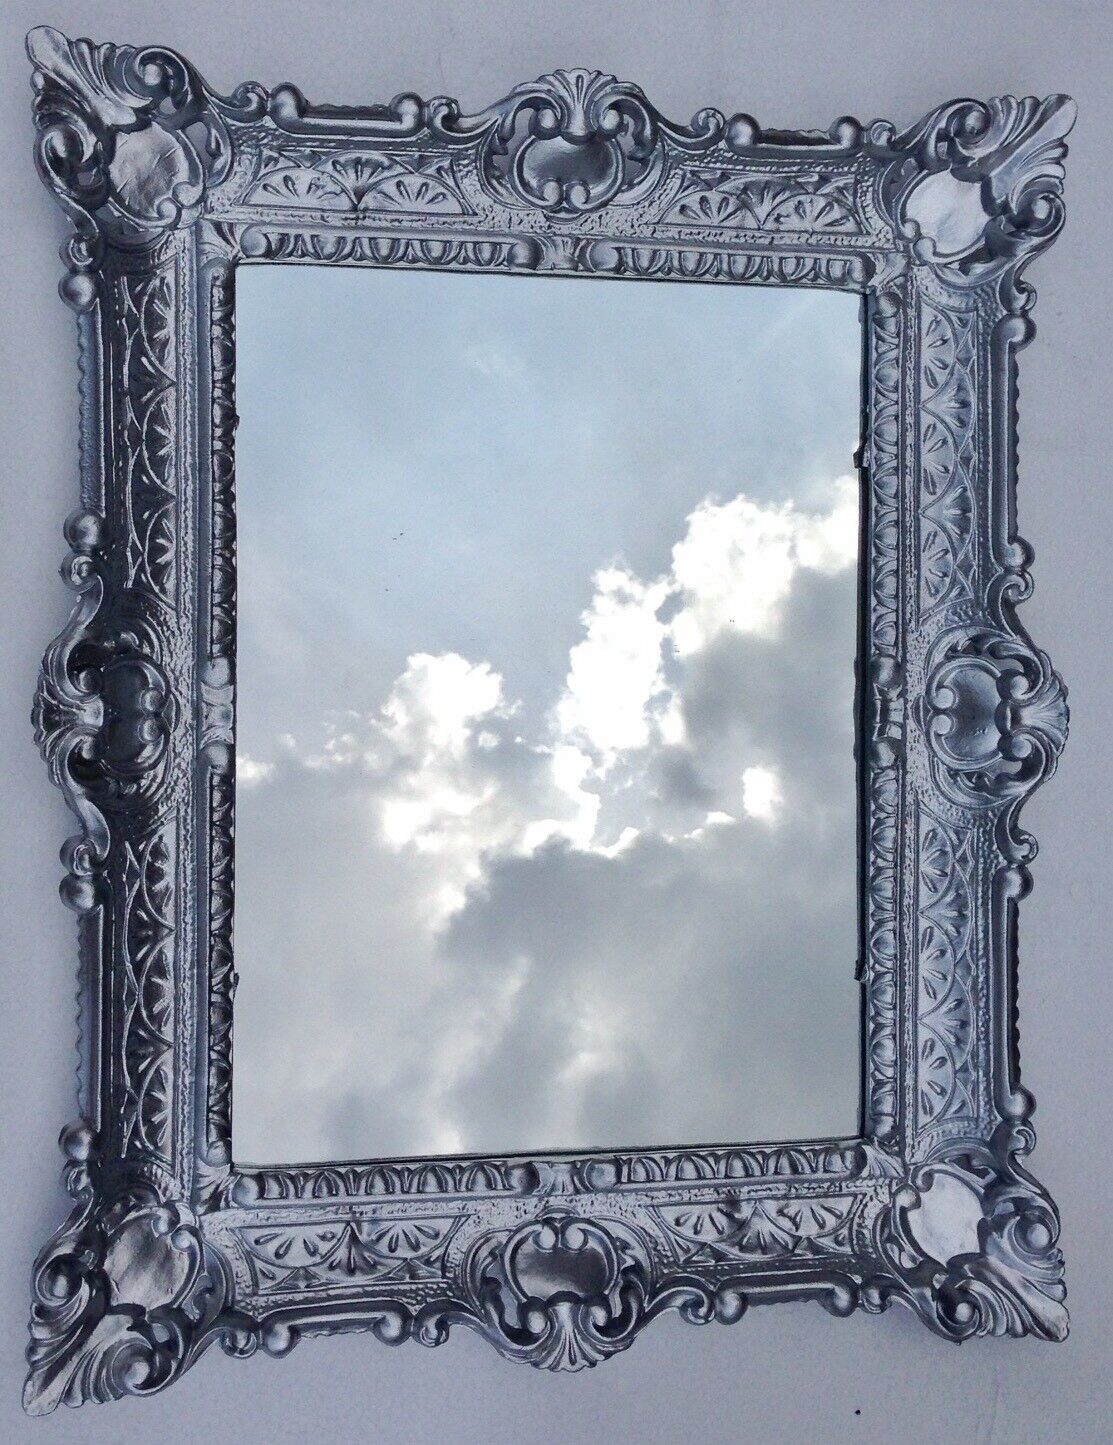 Spiegel SET silber Fotorahmen Bilder 13x18 Rahmen Barock 2x Bilderrahmen